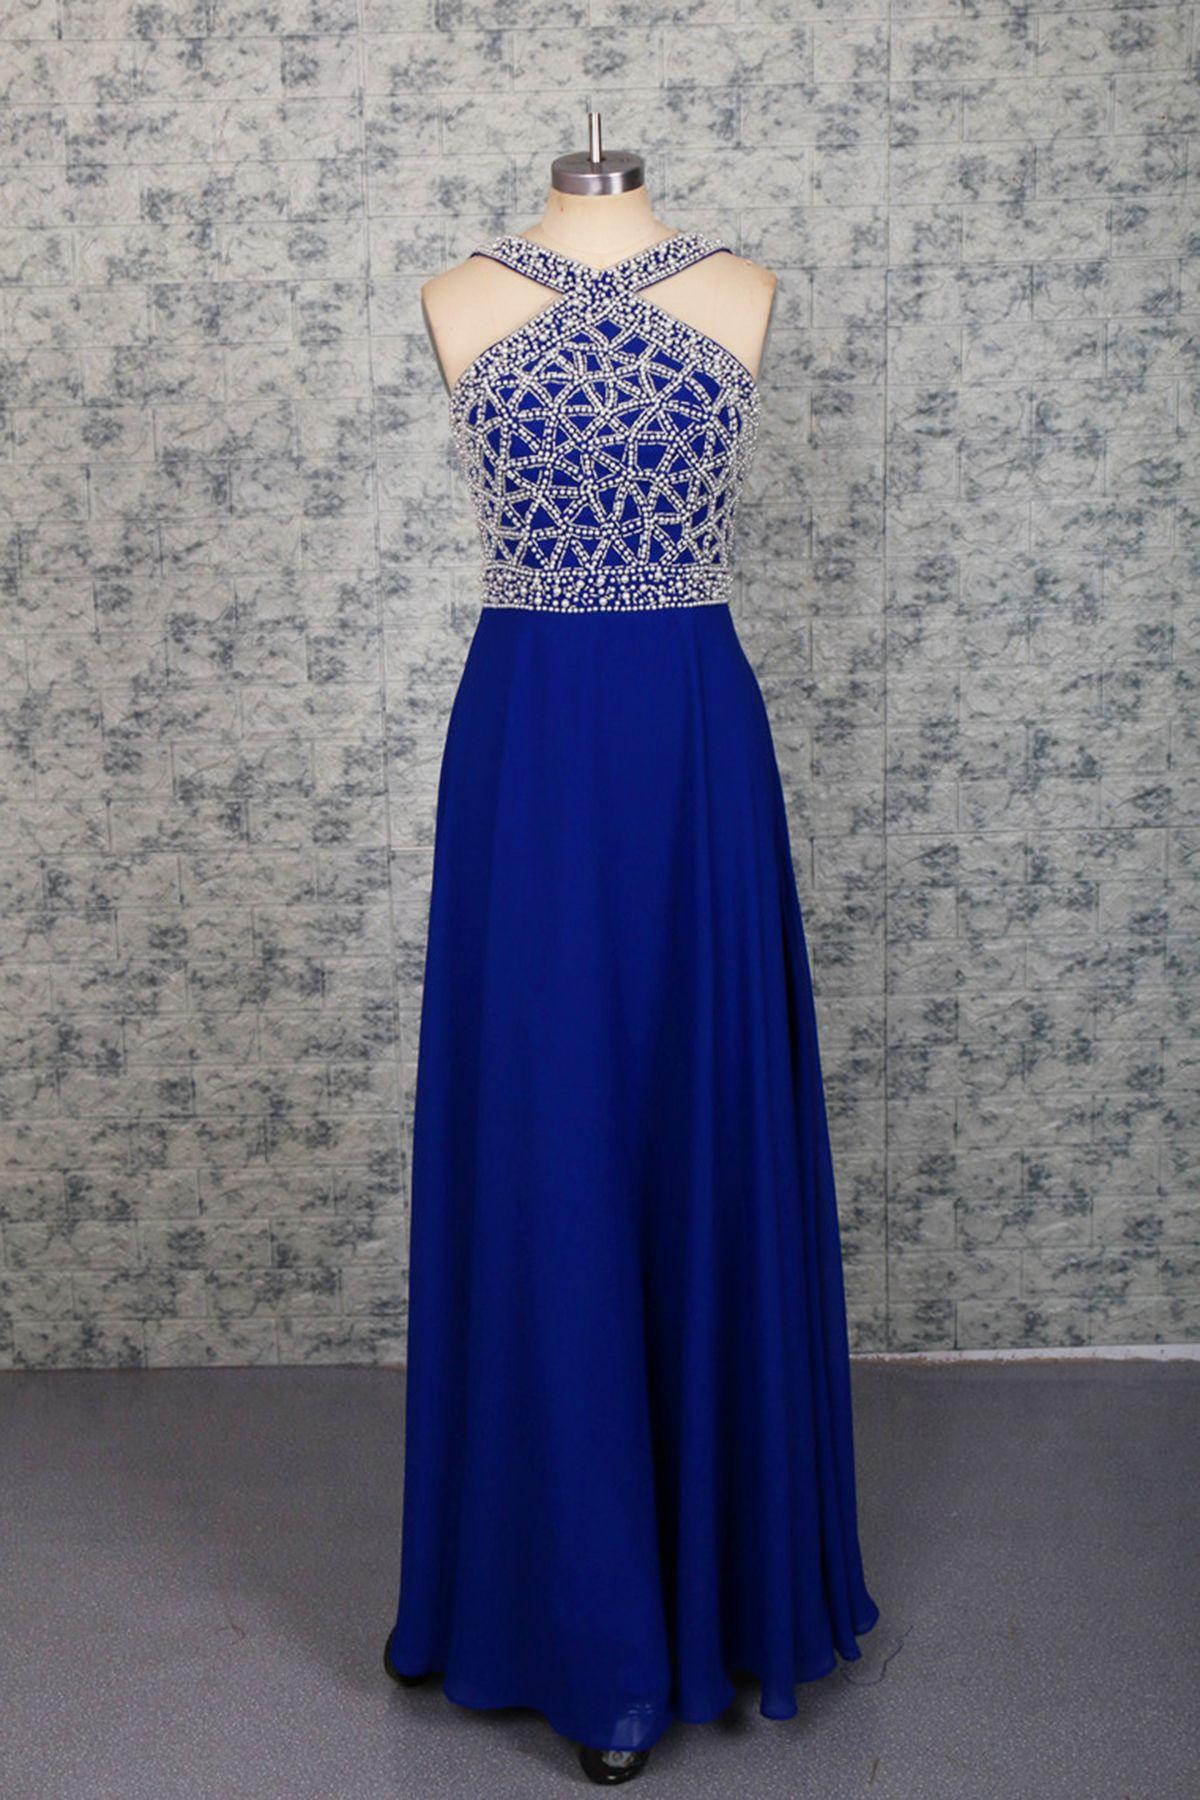 Sequins prom dress halter prom dress cute navy blue chiffon prom